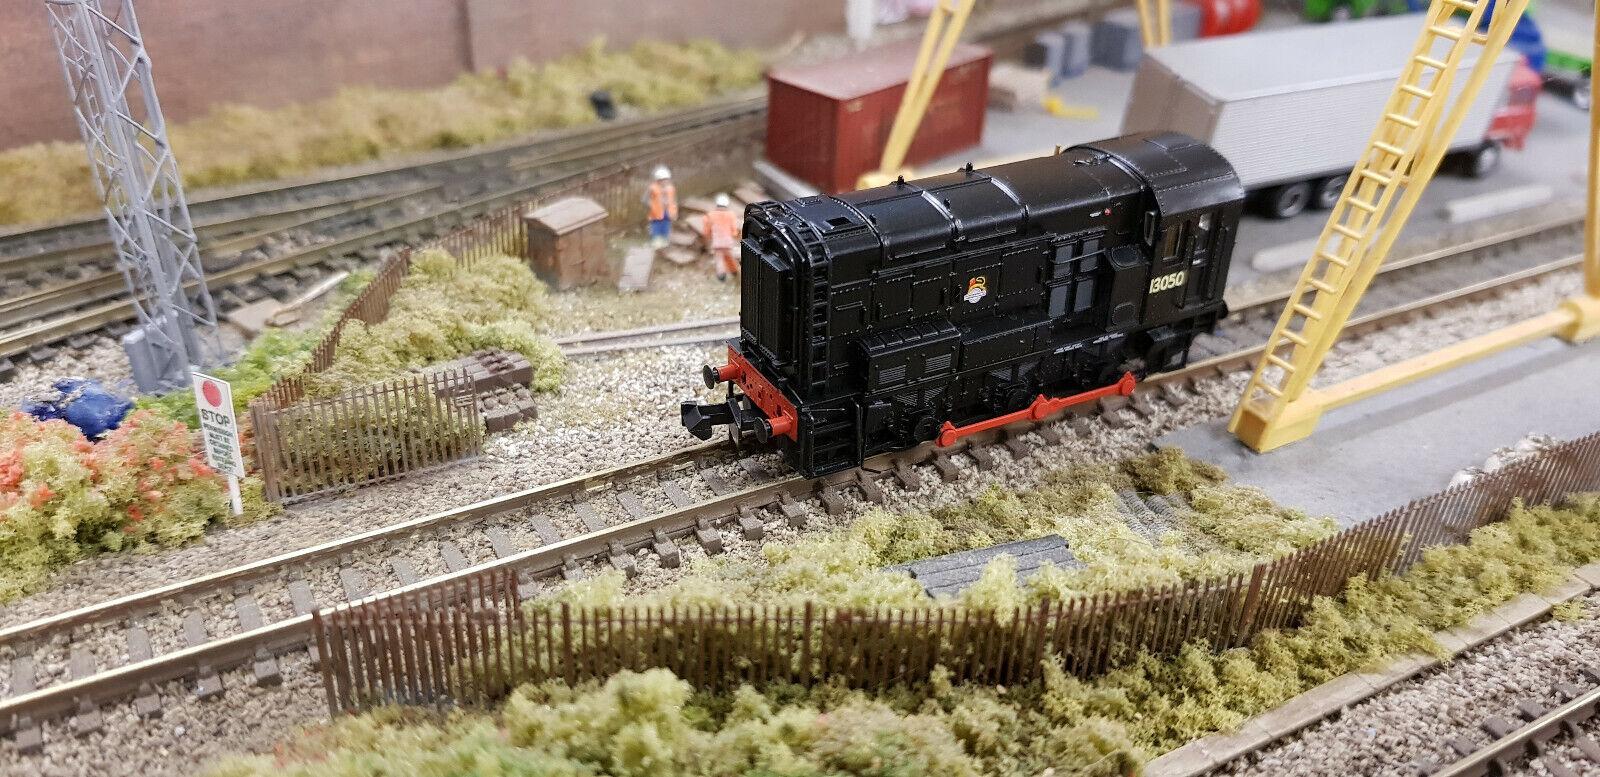 Graham Farish 371-020A Class 08 13050 BR nero Early Emblem N Gauge